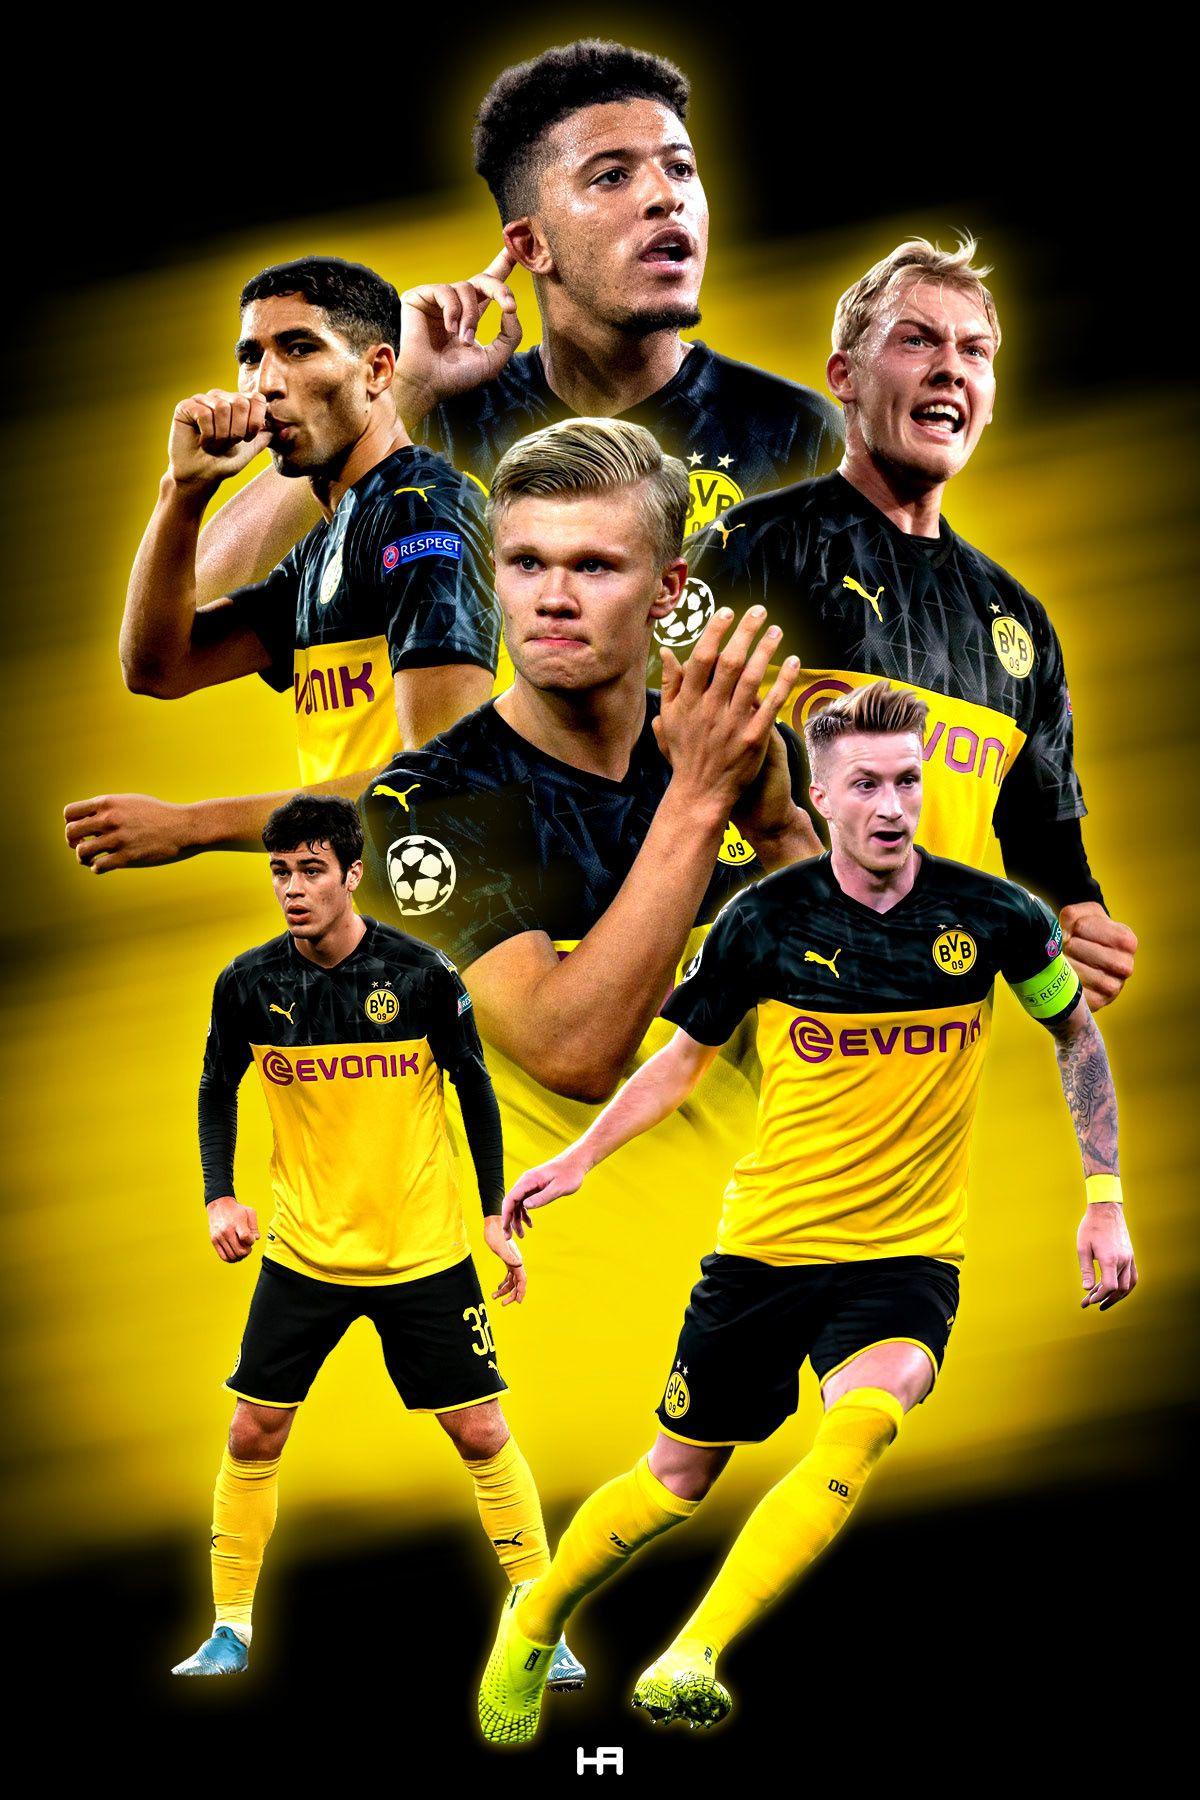 Football Edits 2020 On Behance In 2020 Soccer Guys Soccer Photography Football Wallpaper